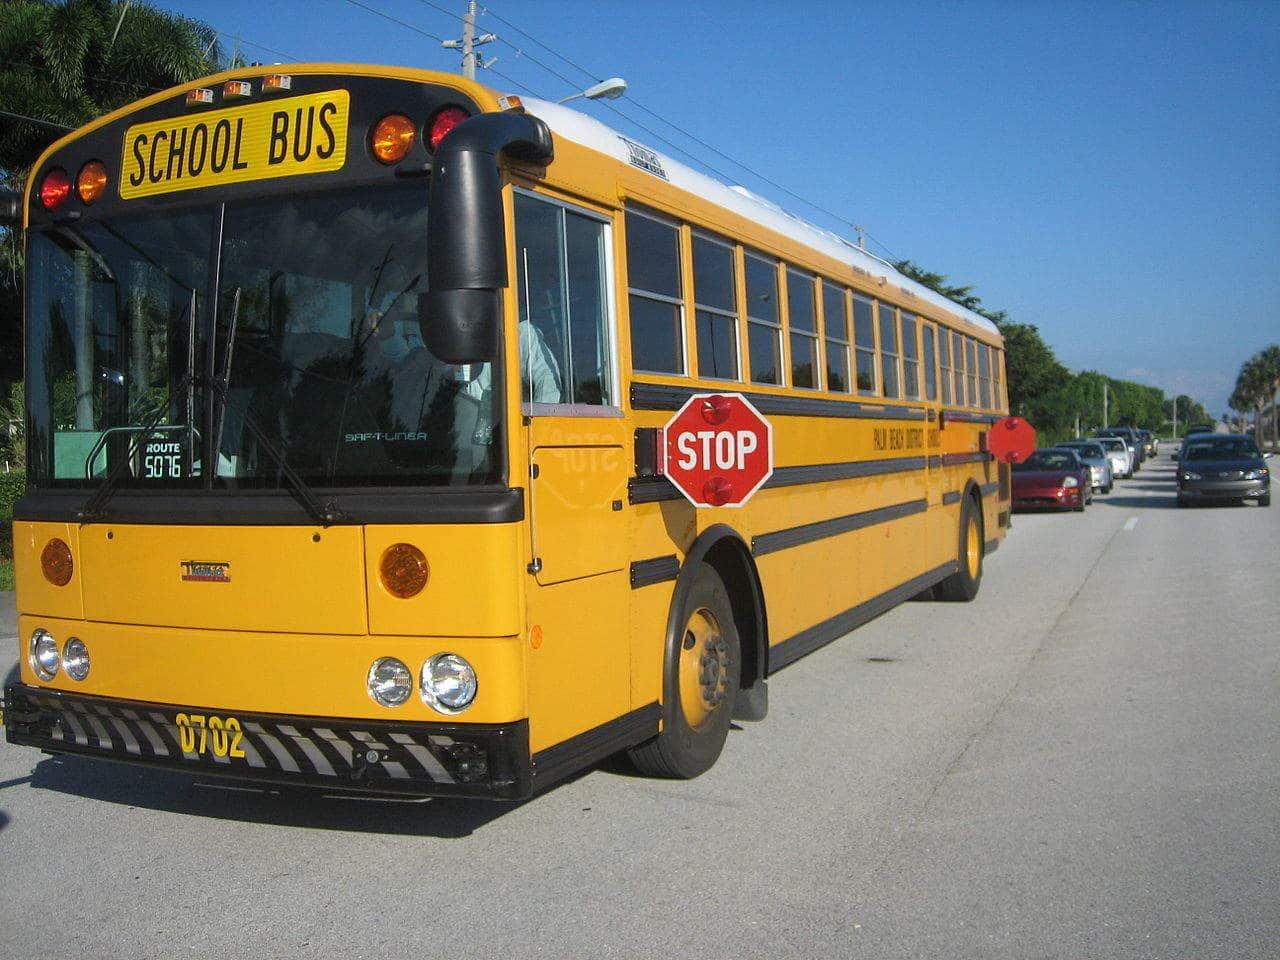 image of school bus via wikicommons